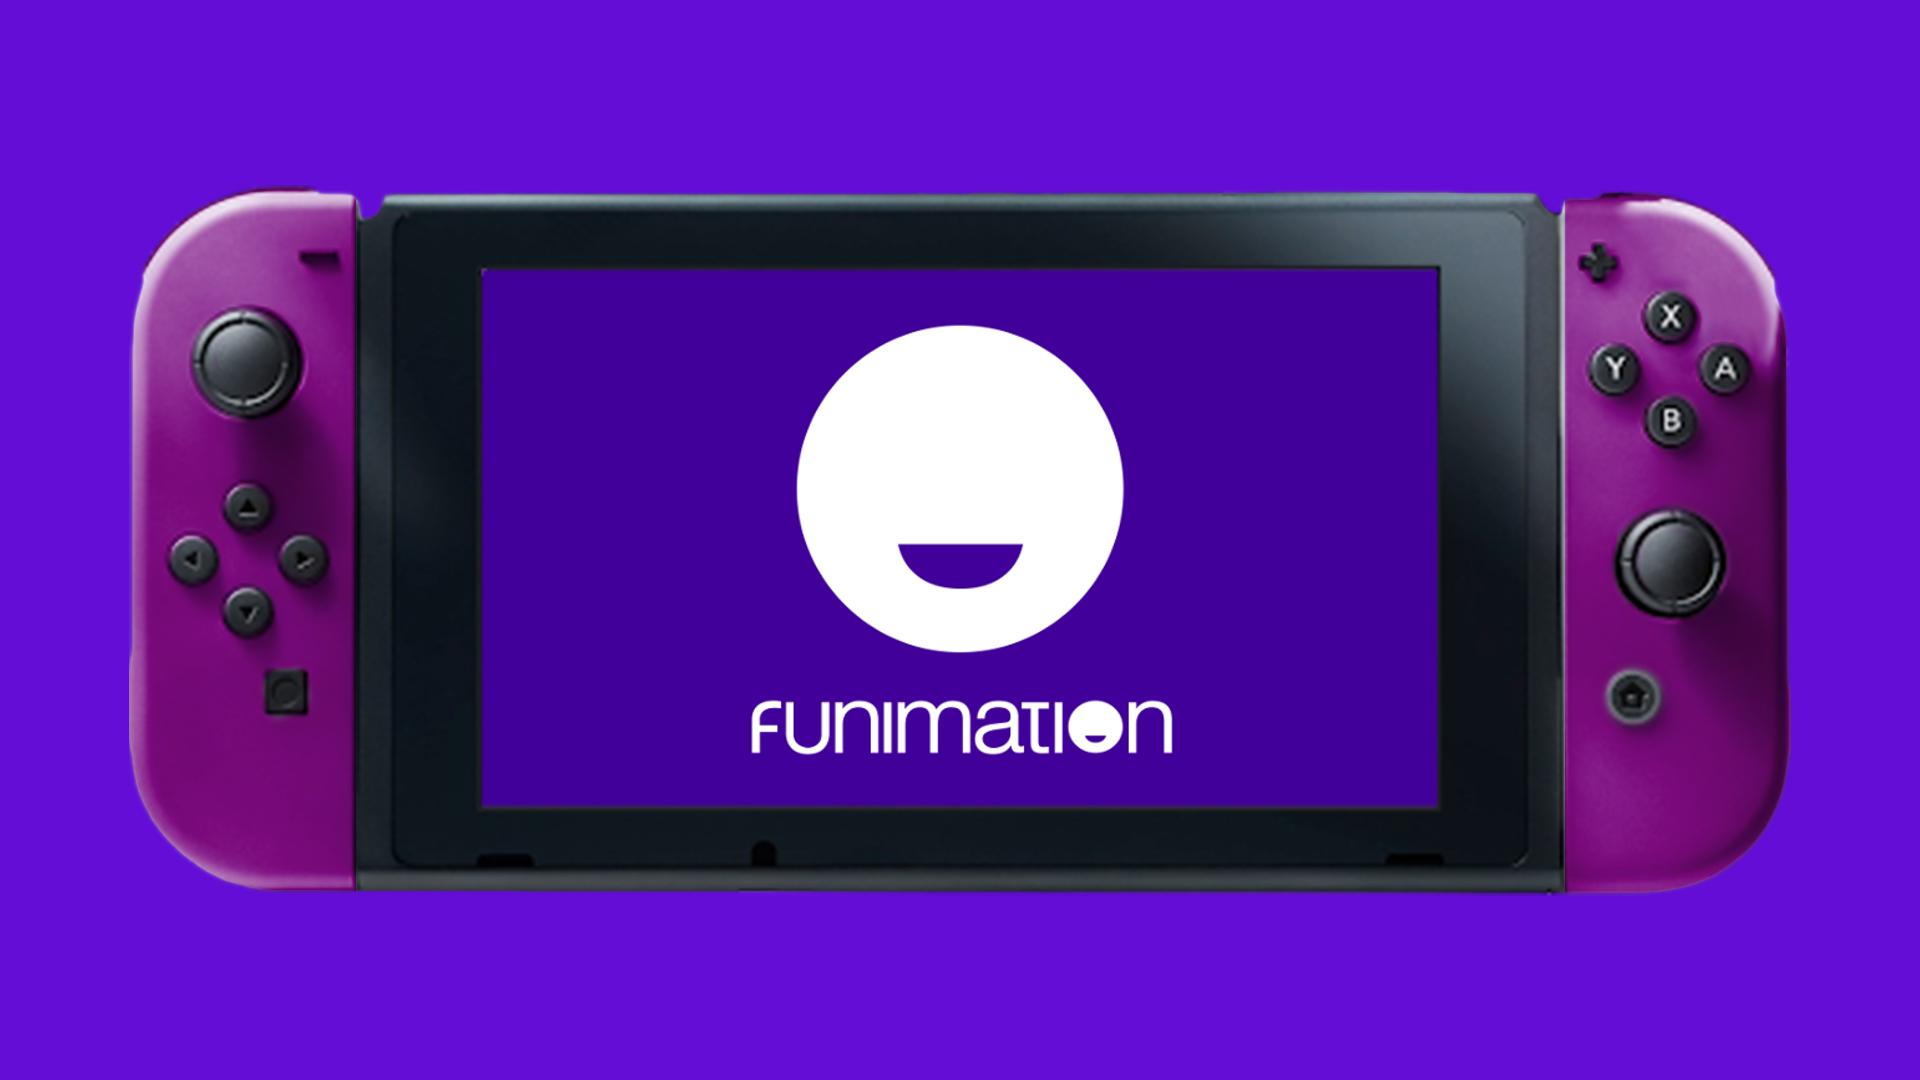 Funimation Nintendo Switch